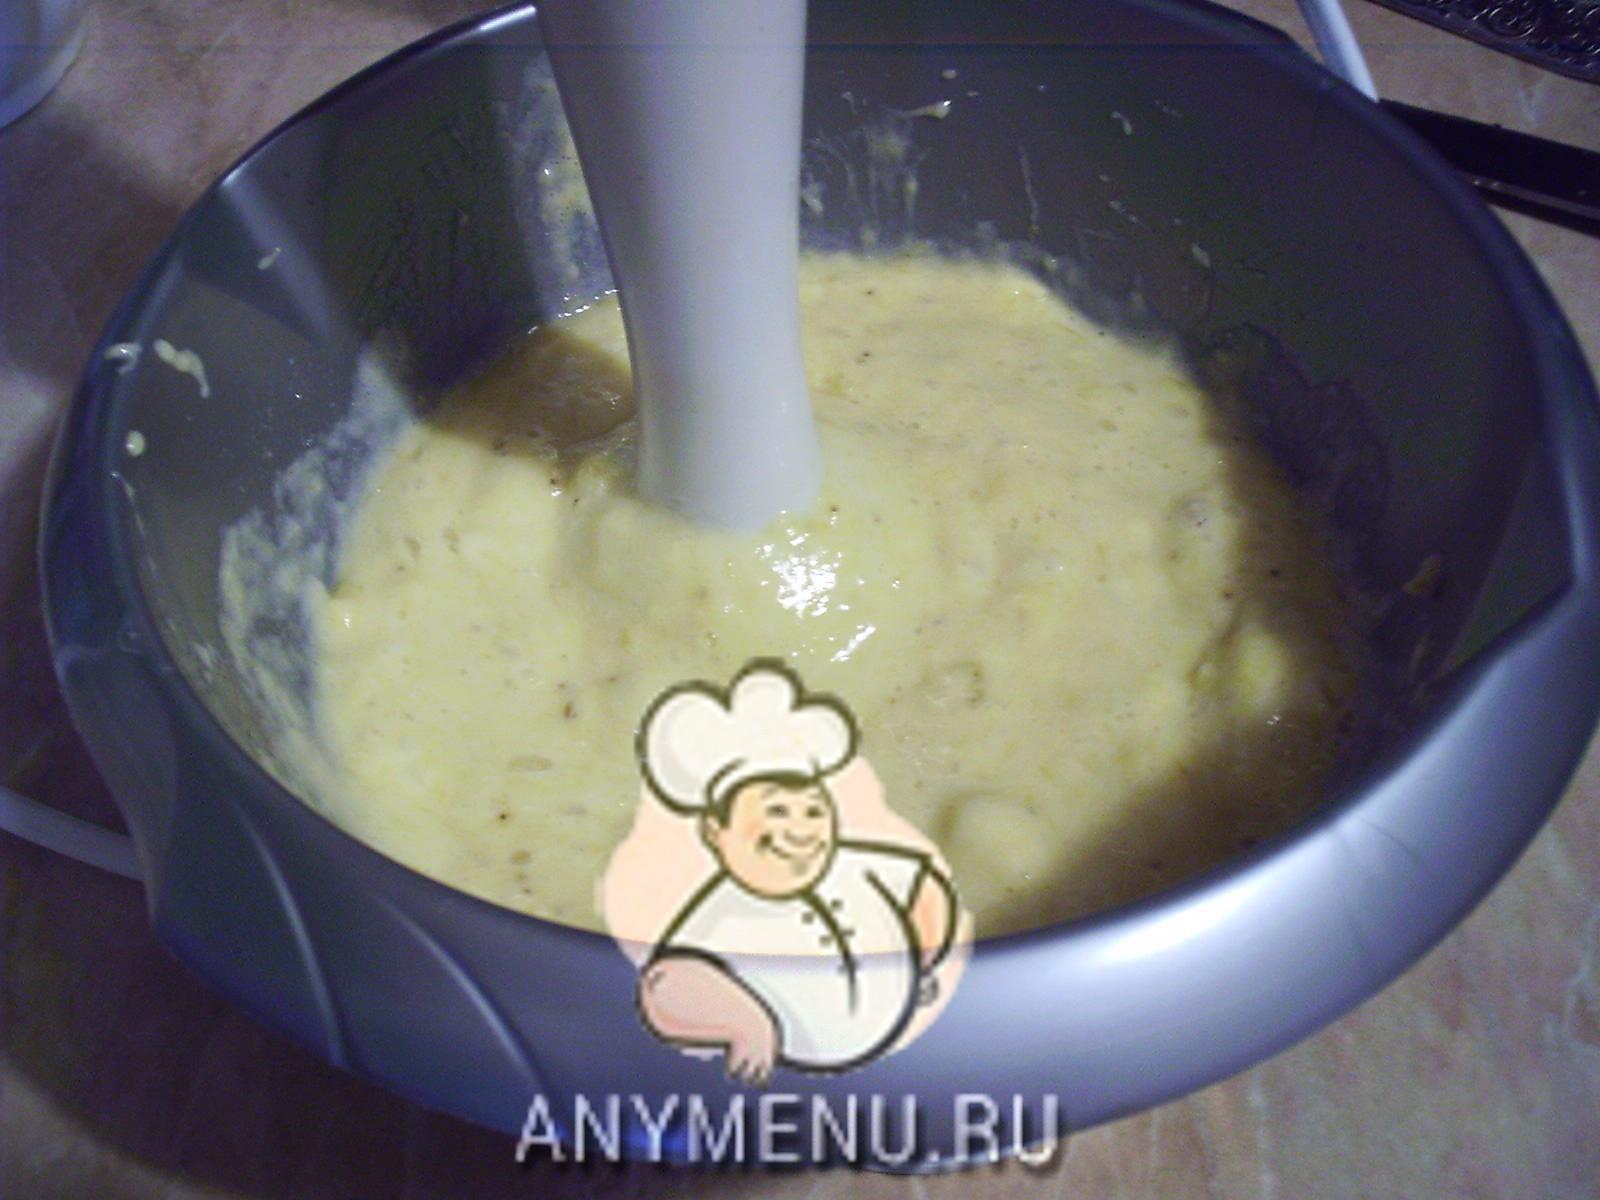 bananovyj-pirog